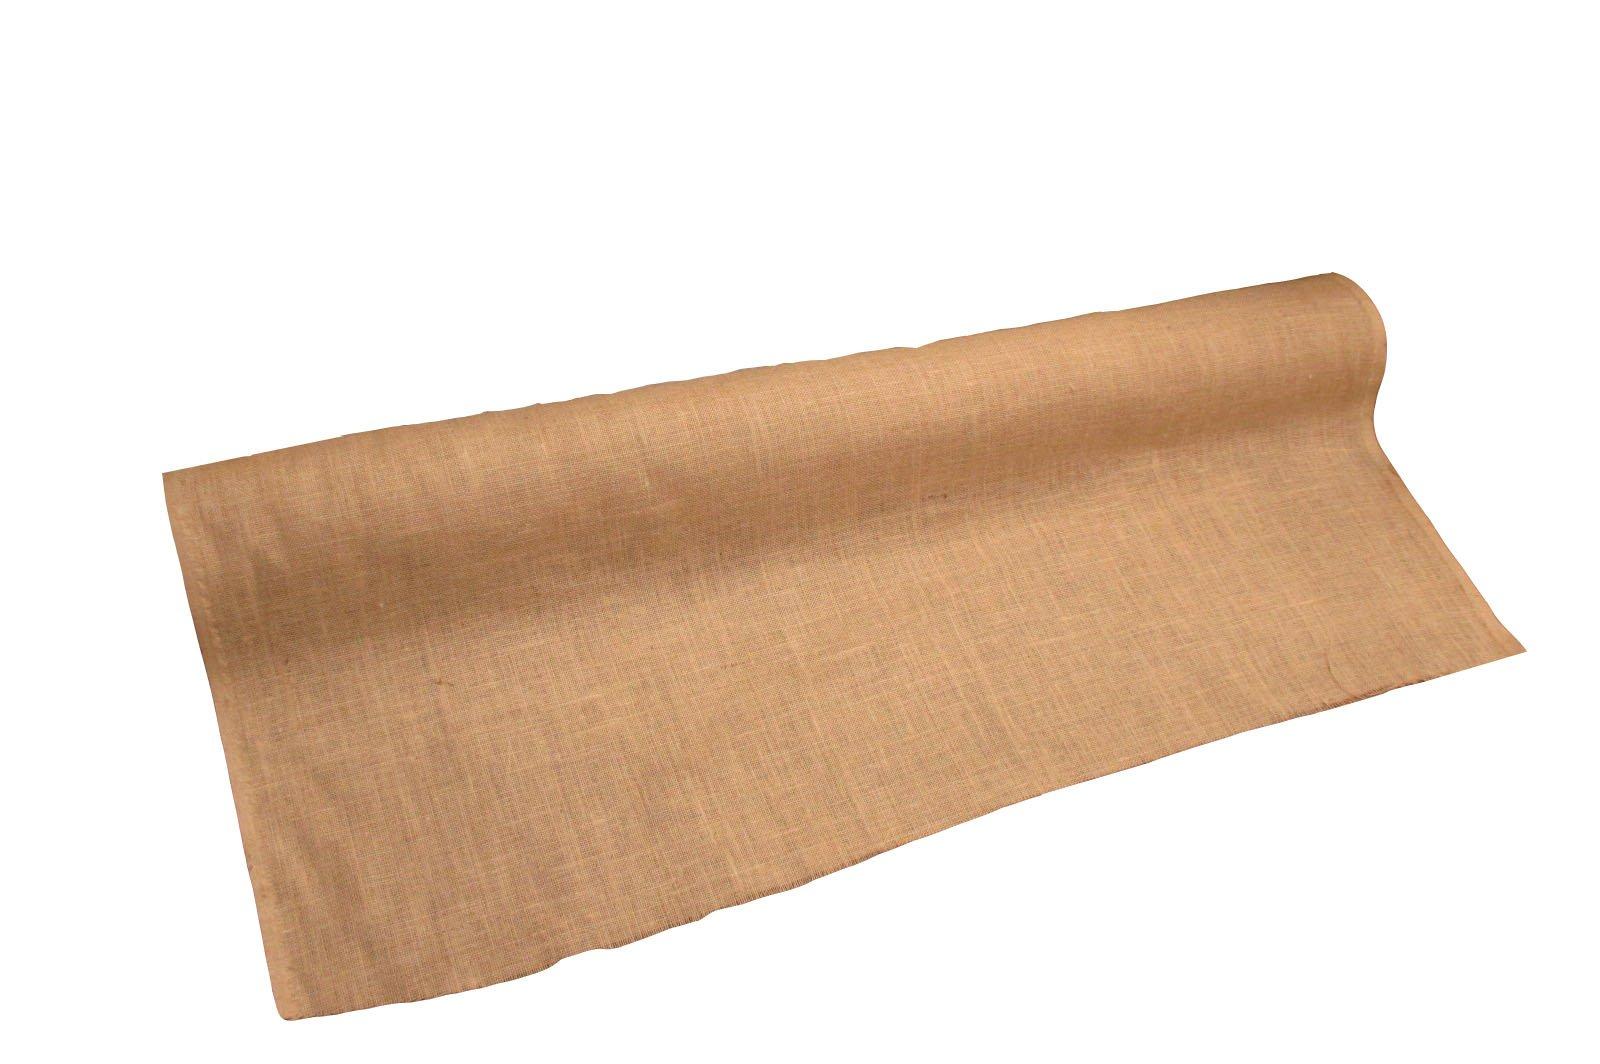 LA Linen 60-Inch Wide  Natural Burlap , 20 Yard Roll by LA Linen (Image #1)